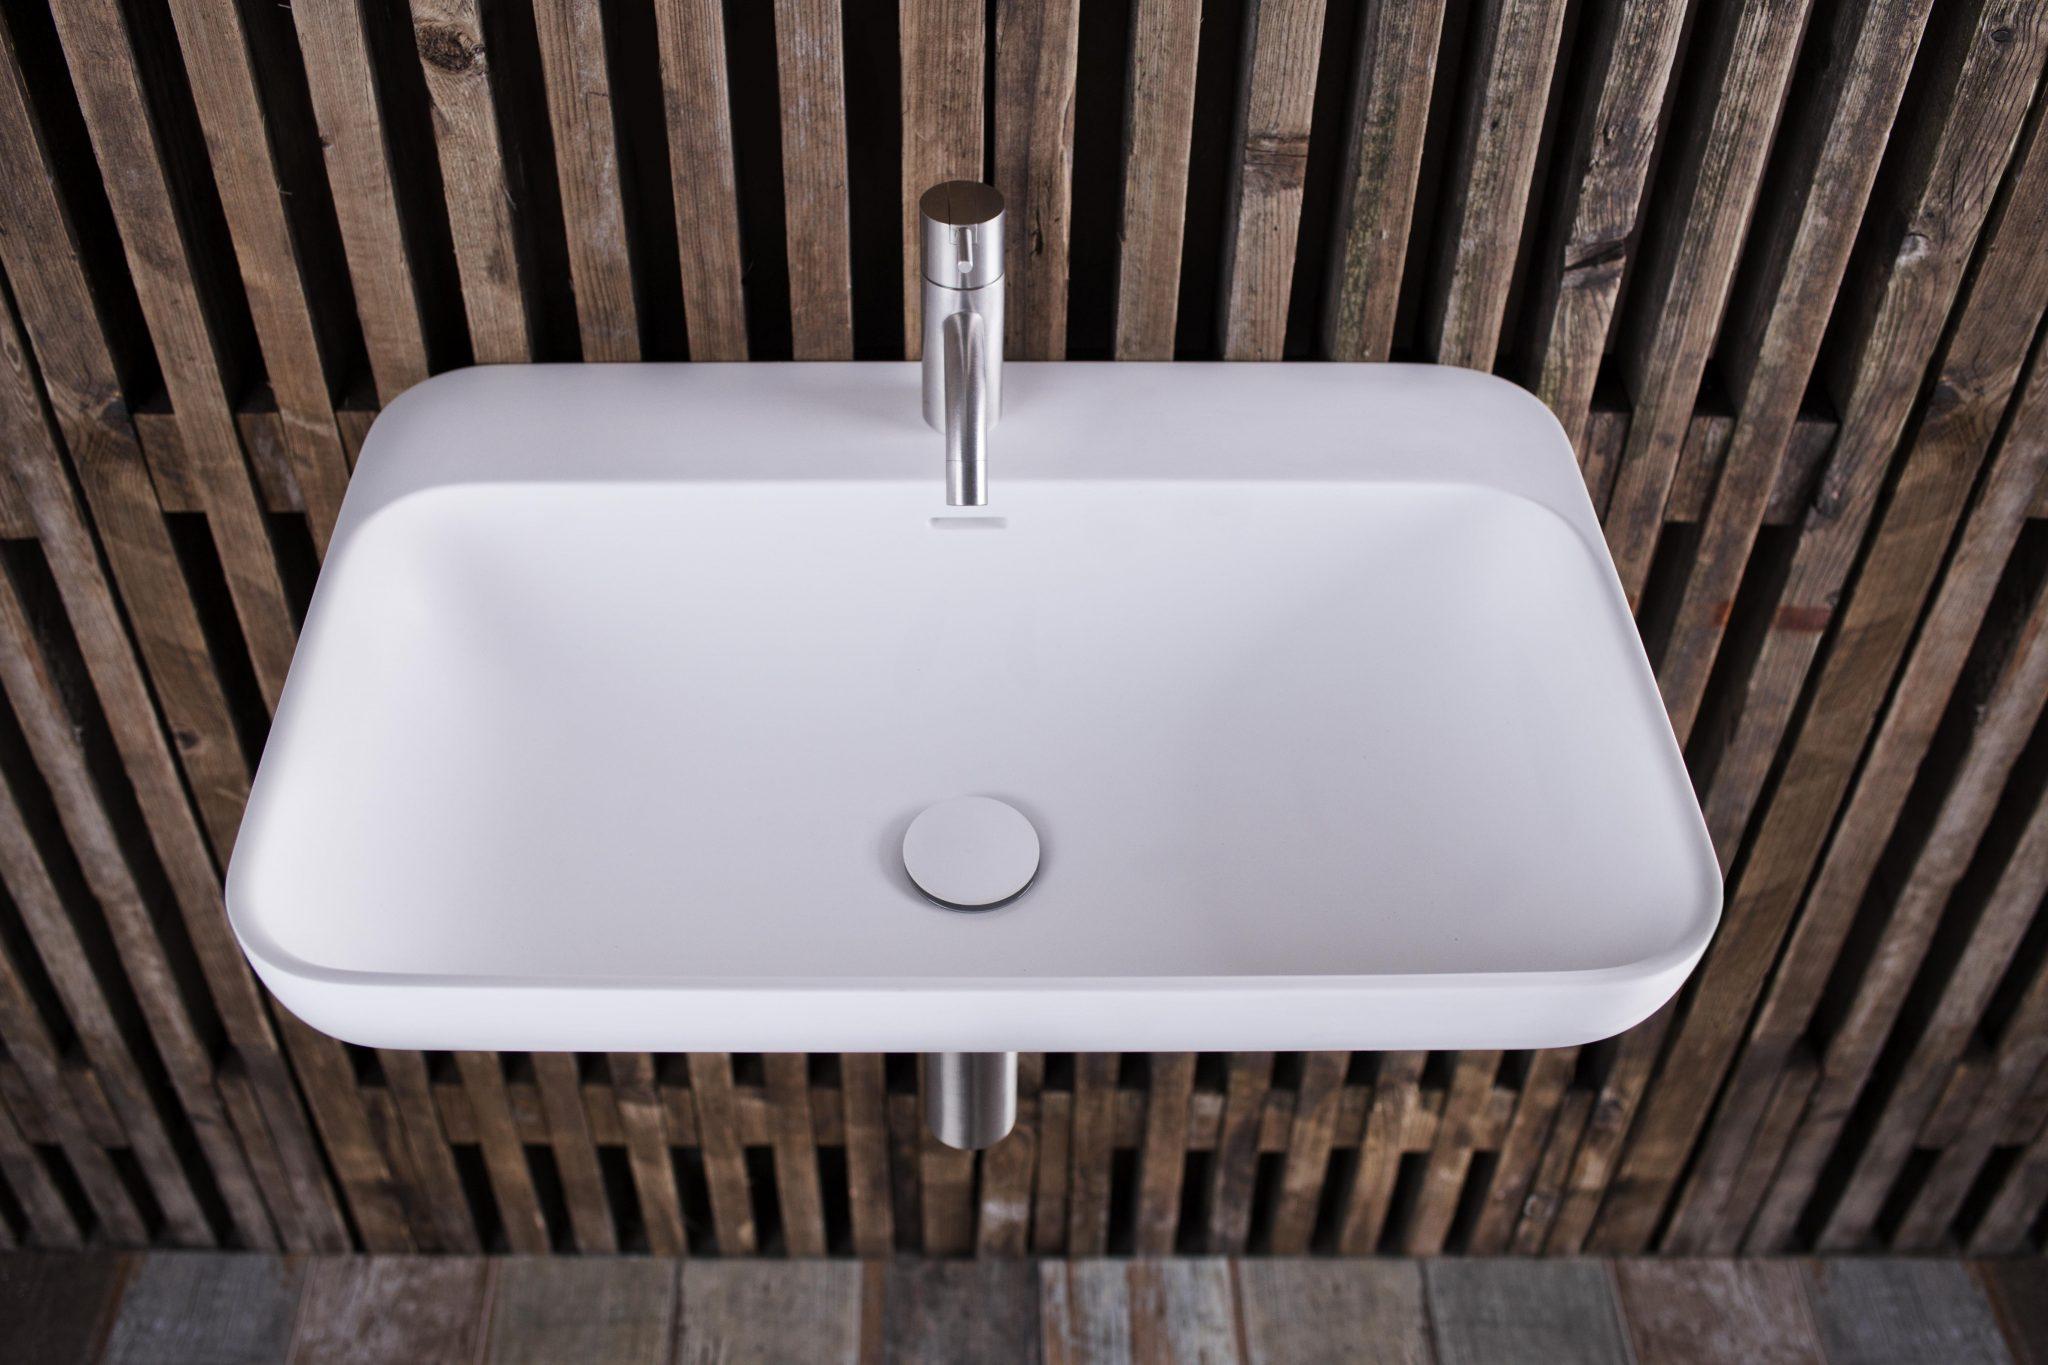 en-60-wash-basin-from-copenhagen-bath_26556890385_o